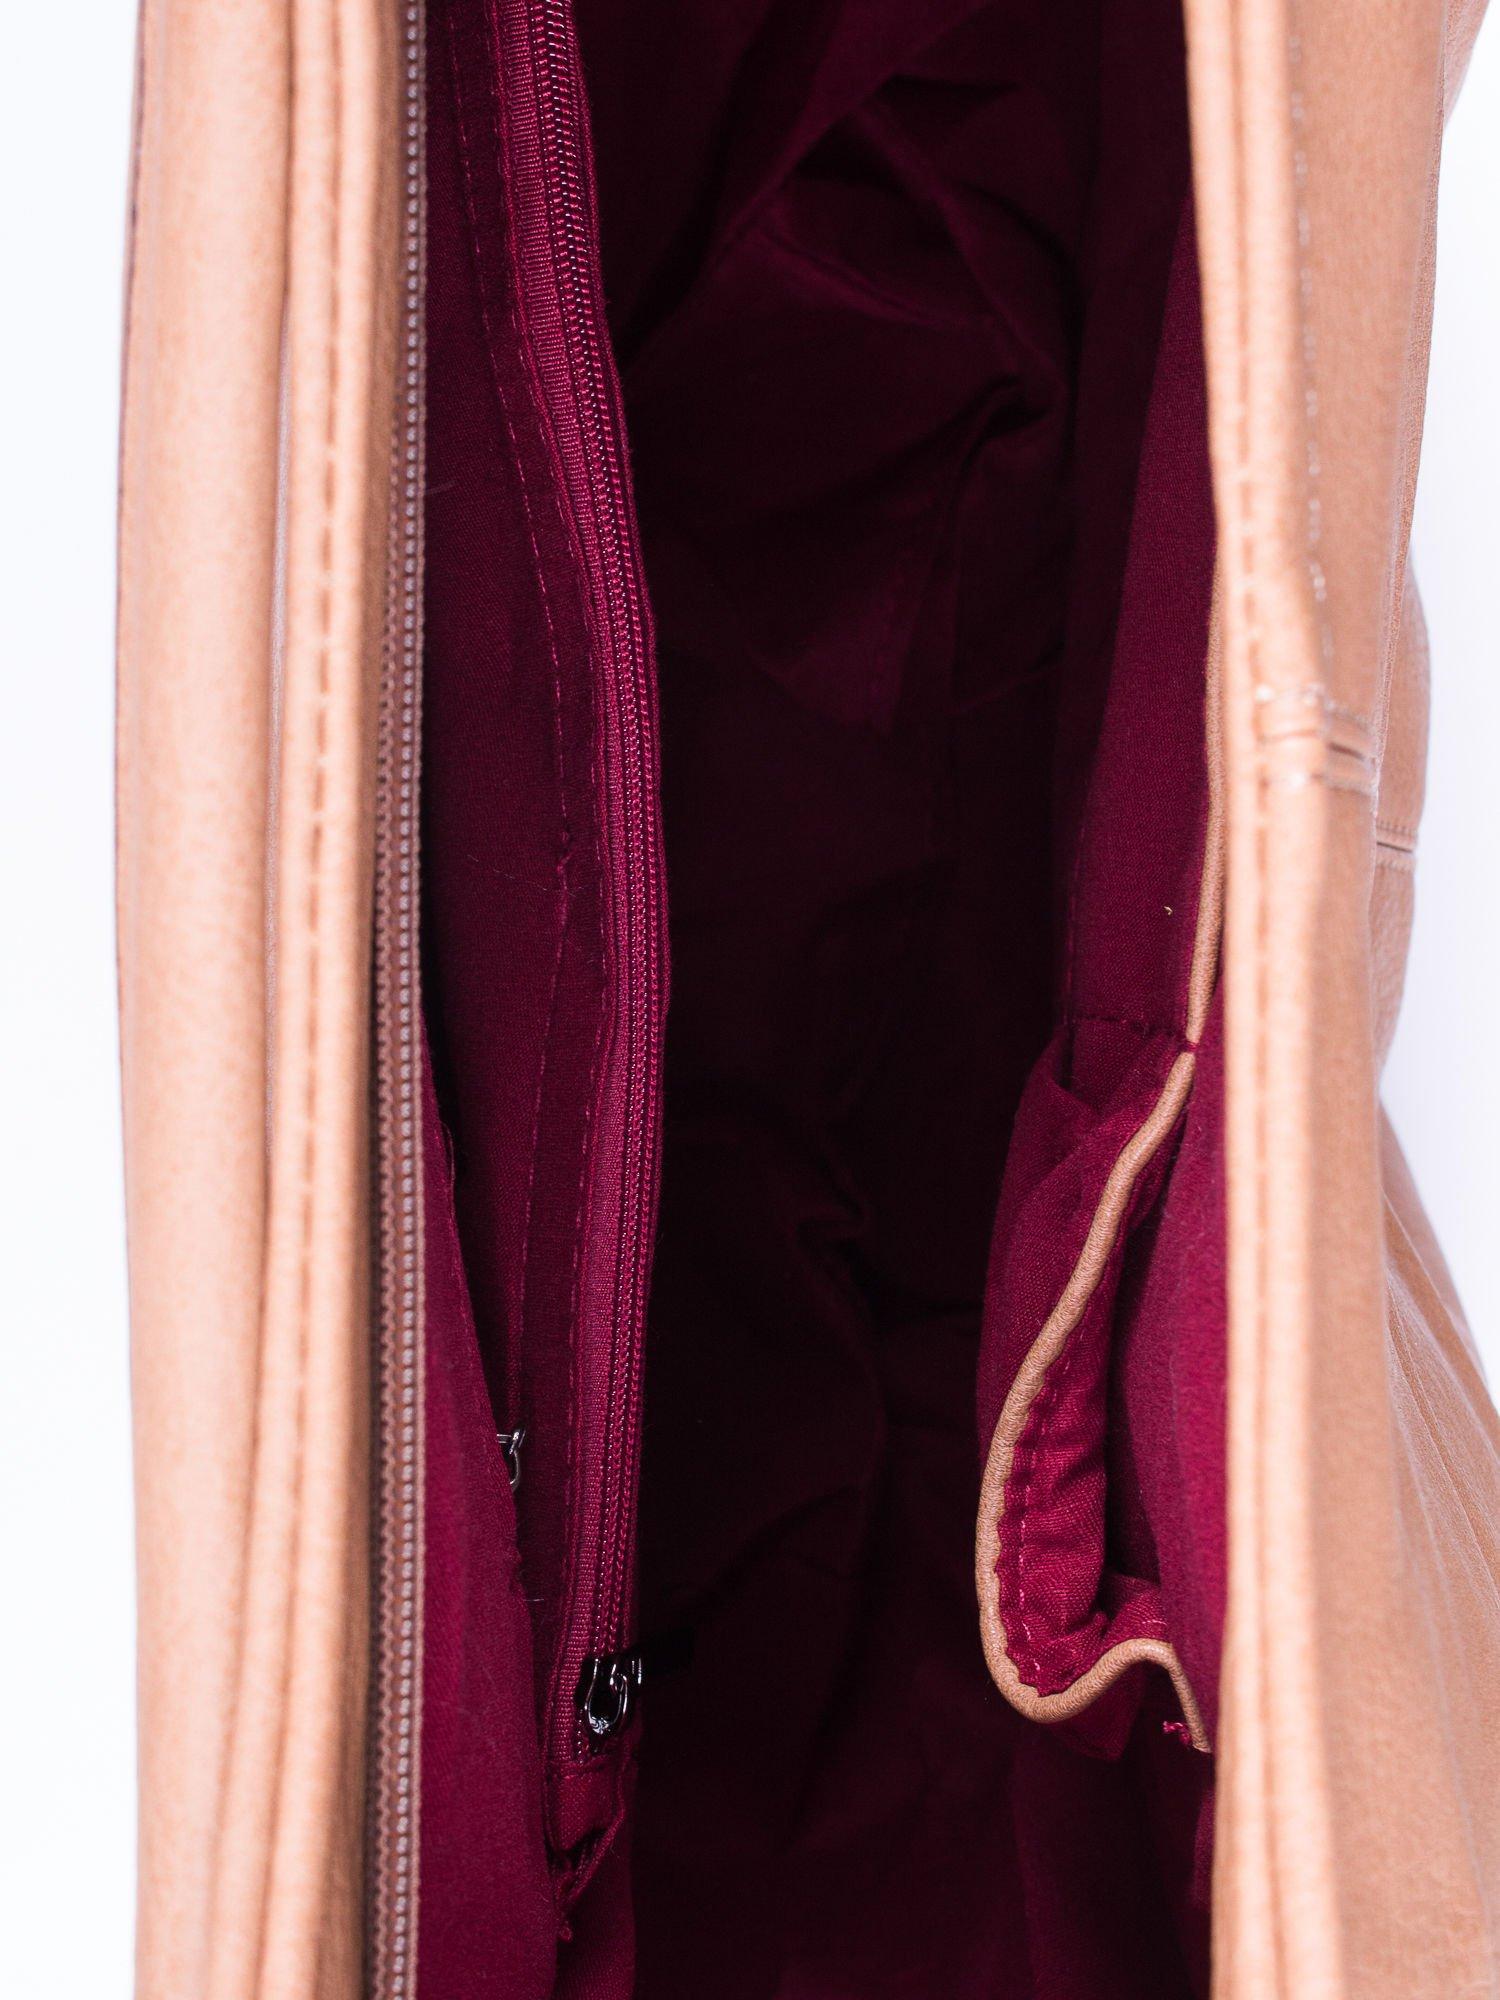 Khaki torba hobo z suwakami po bokach                                  zdj.                                  4